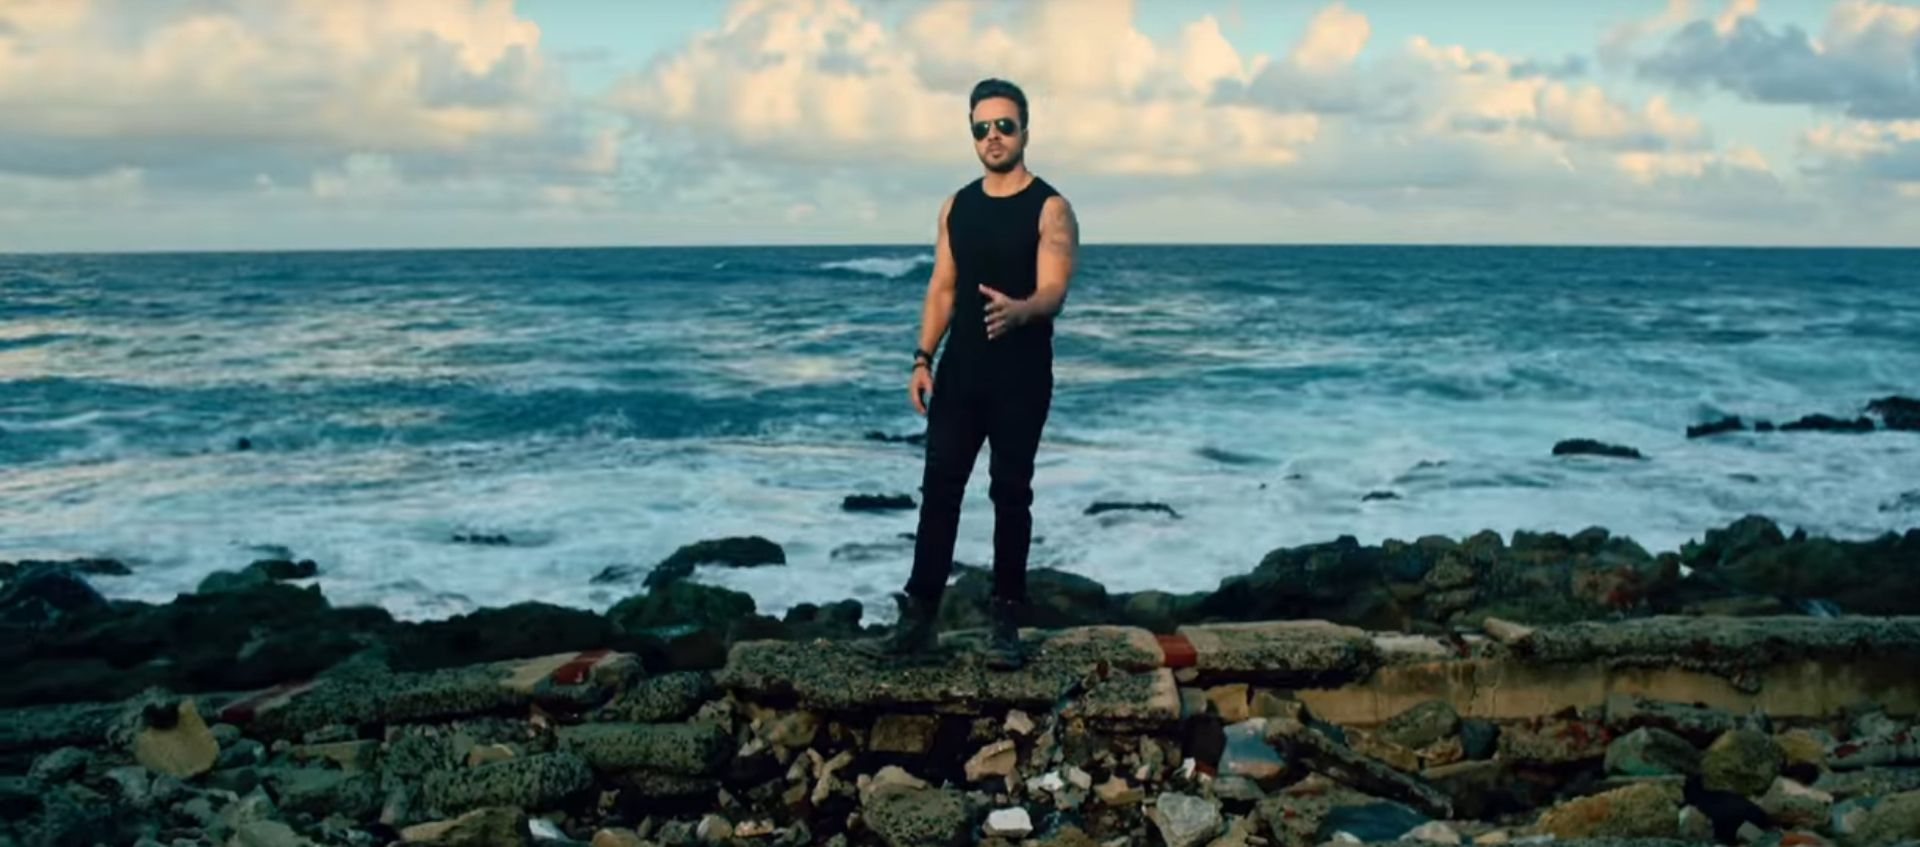 HAKIRAN VEVO 'Despacito' izbisan s YouTubea